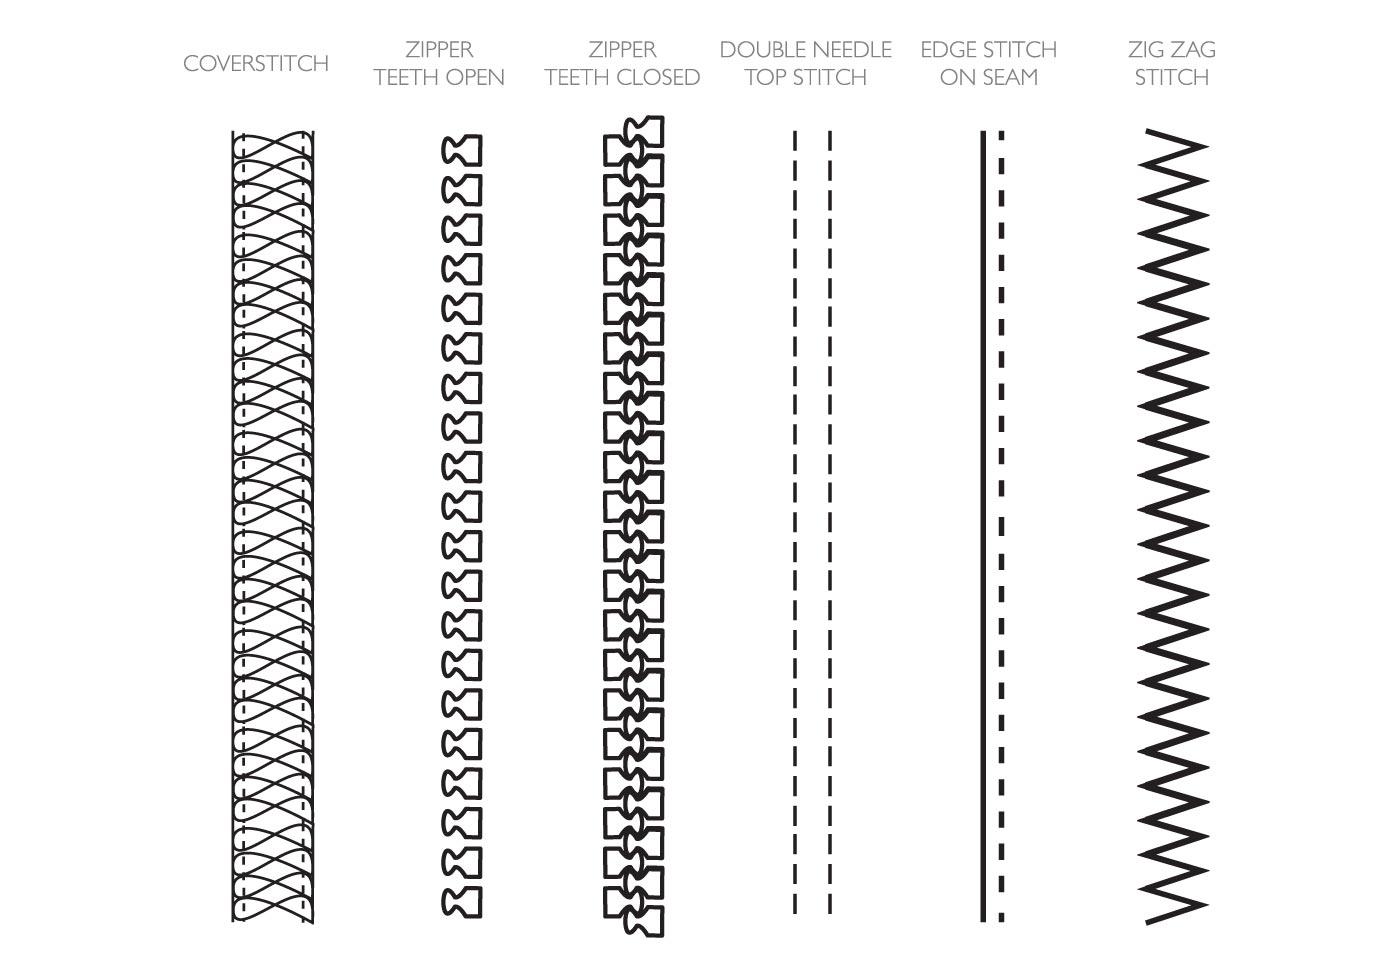 Free Fashion Design Brushes Zippers Amp Stitching